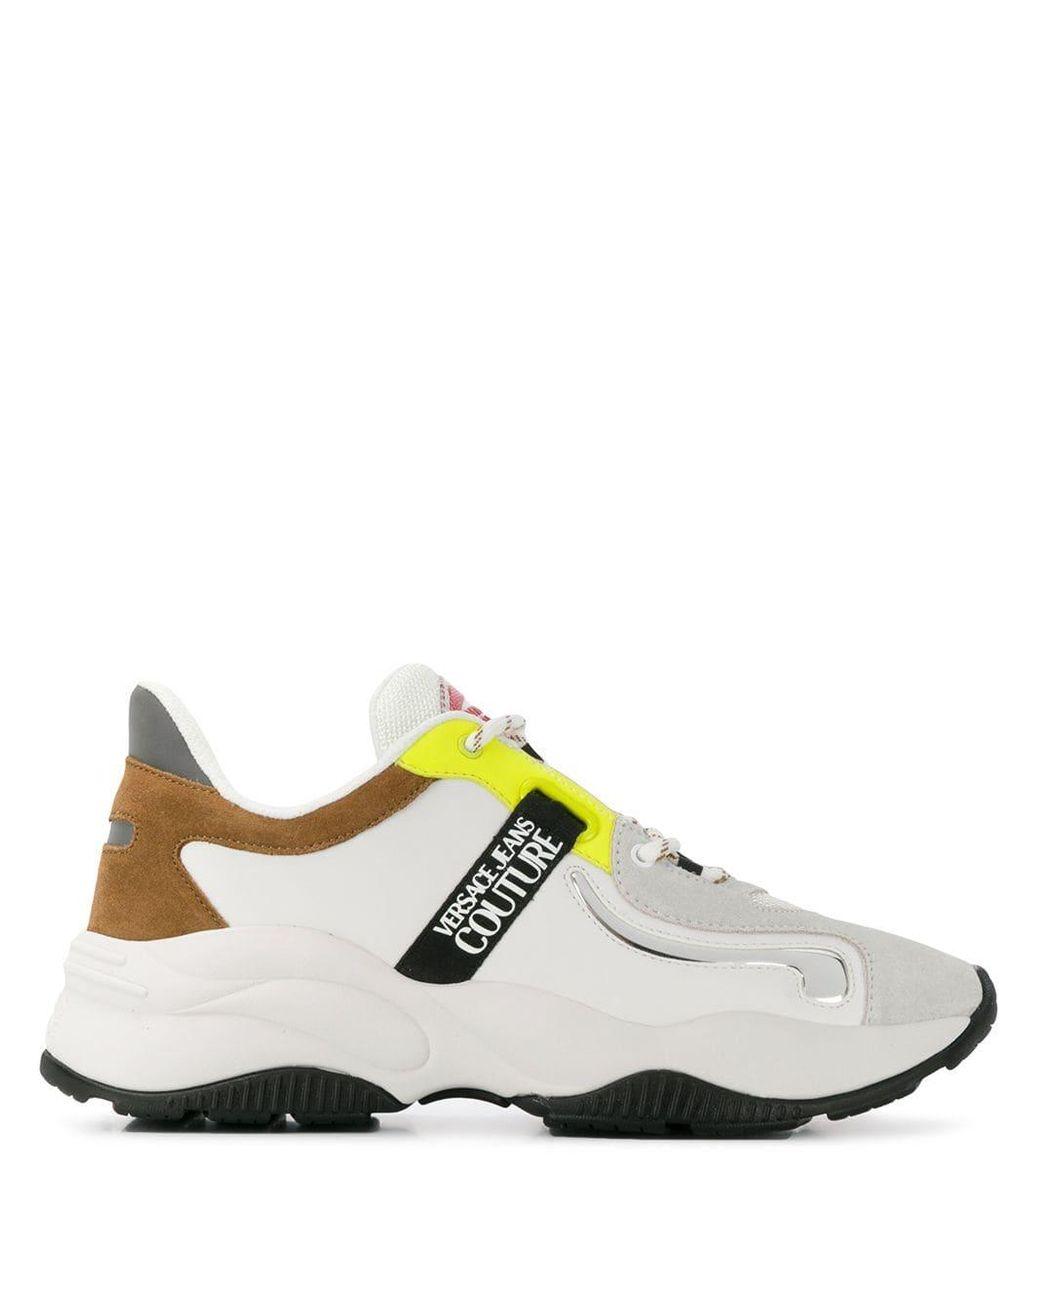 detailed look 0e333 ea4d6 Men's White Scarpe Sneakers